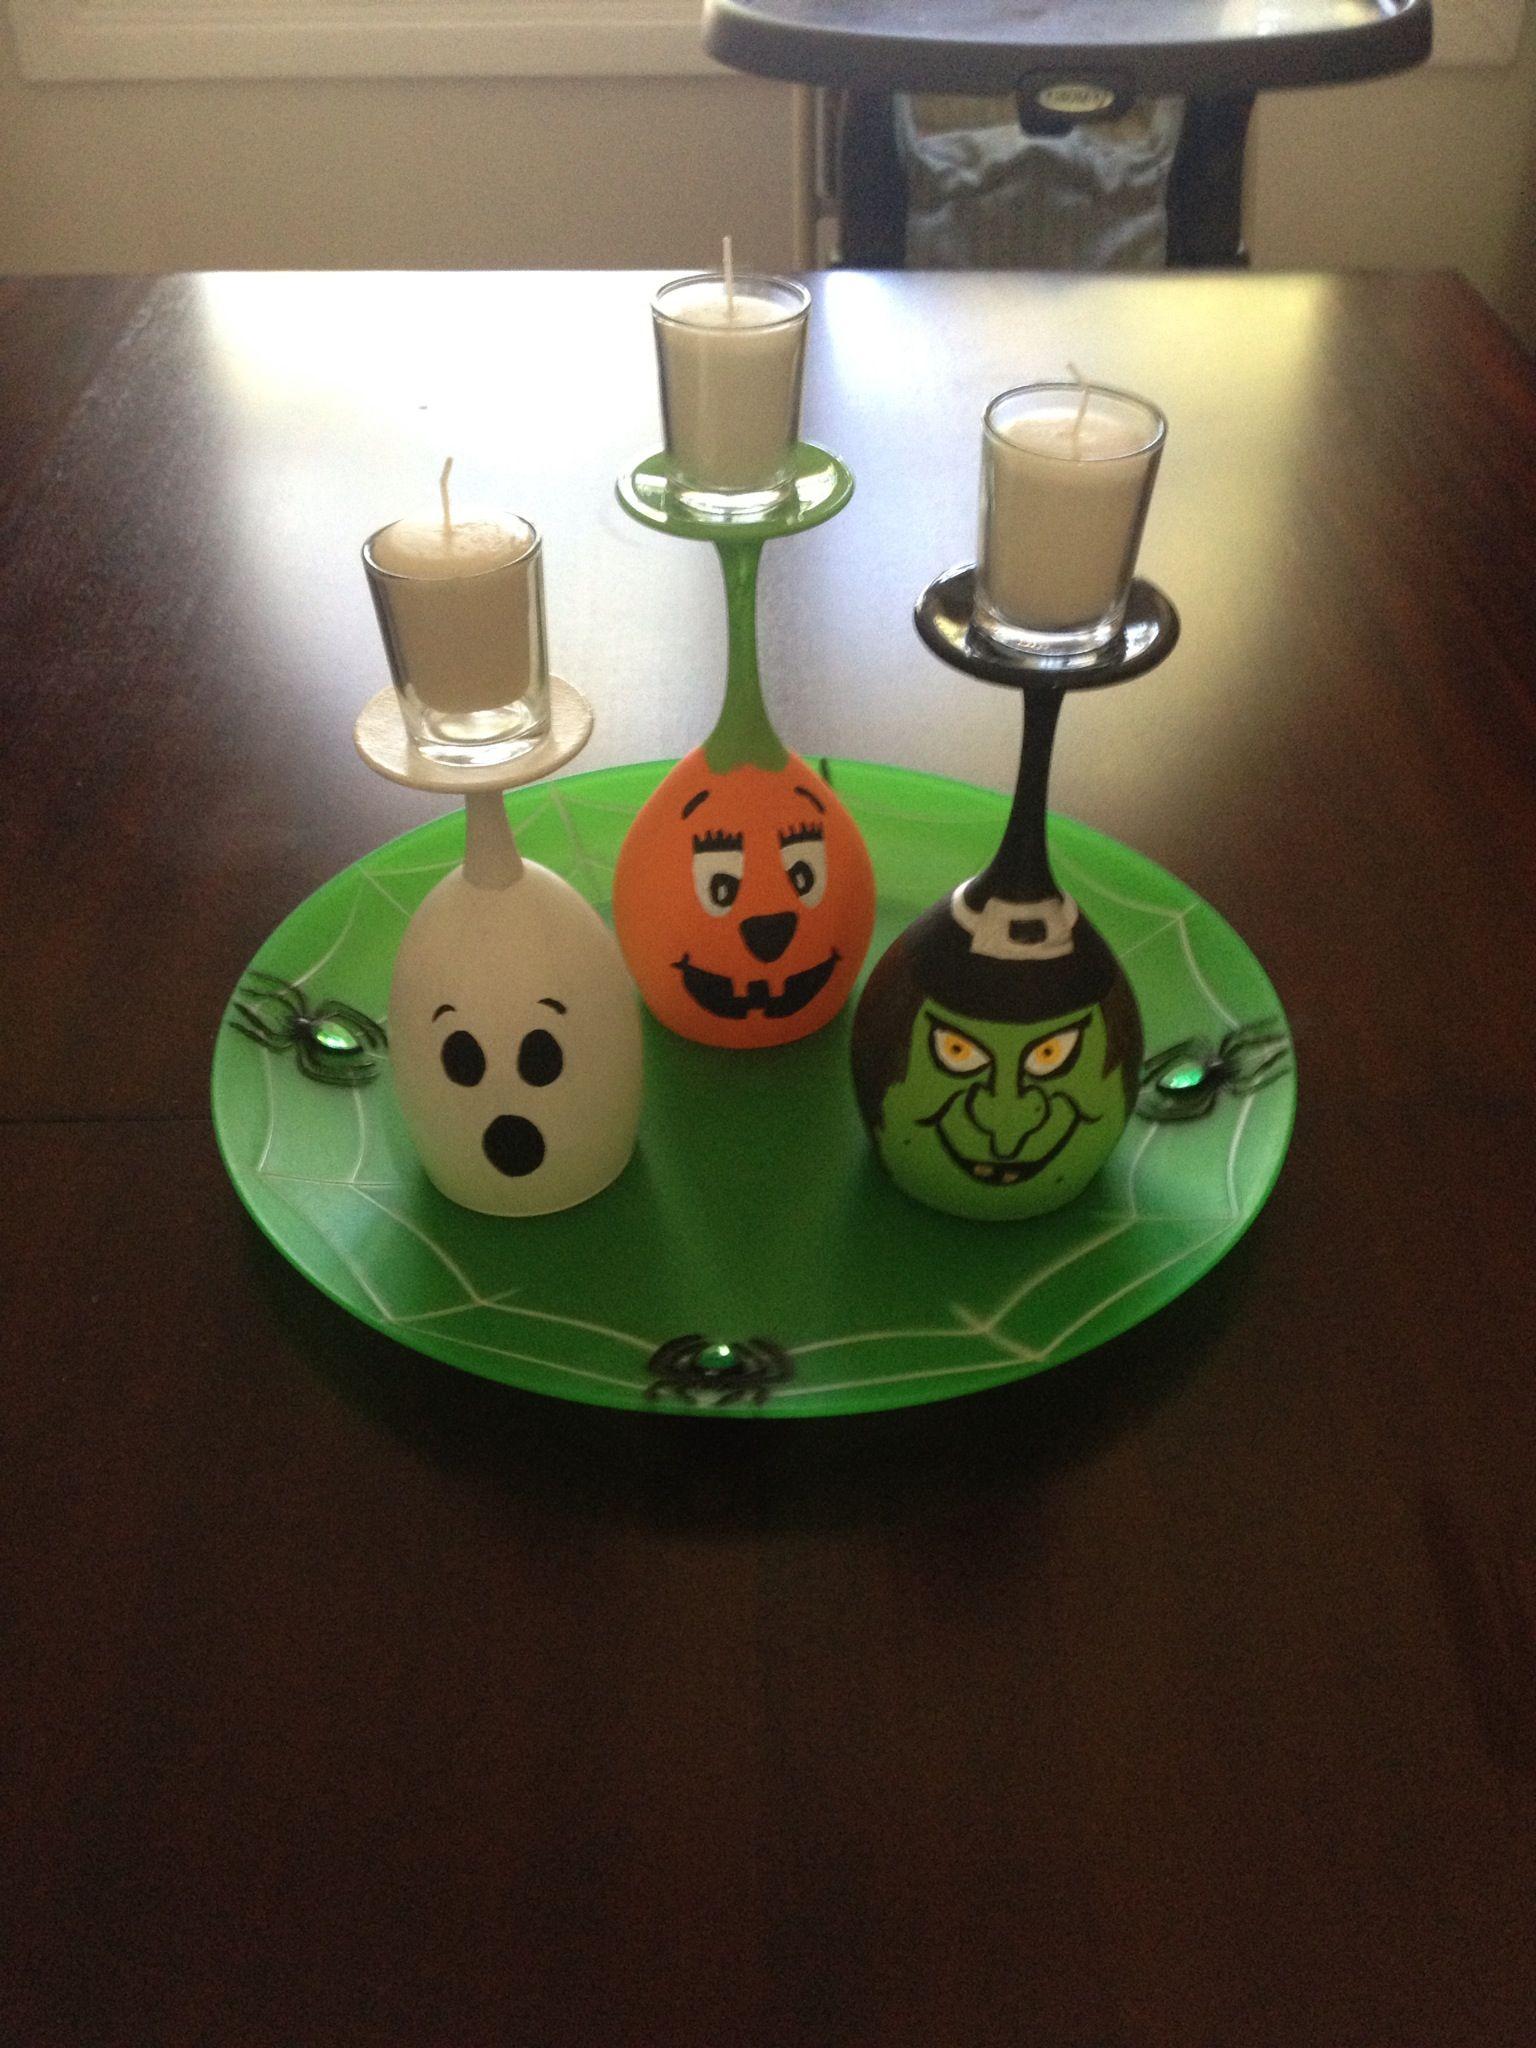 Halloween decor upside down wine glasses Holidays